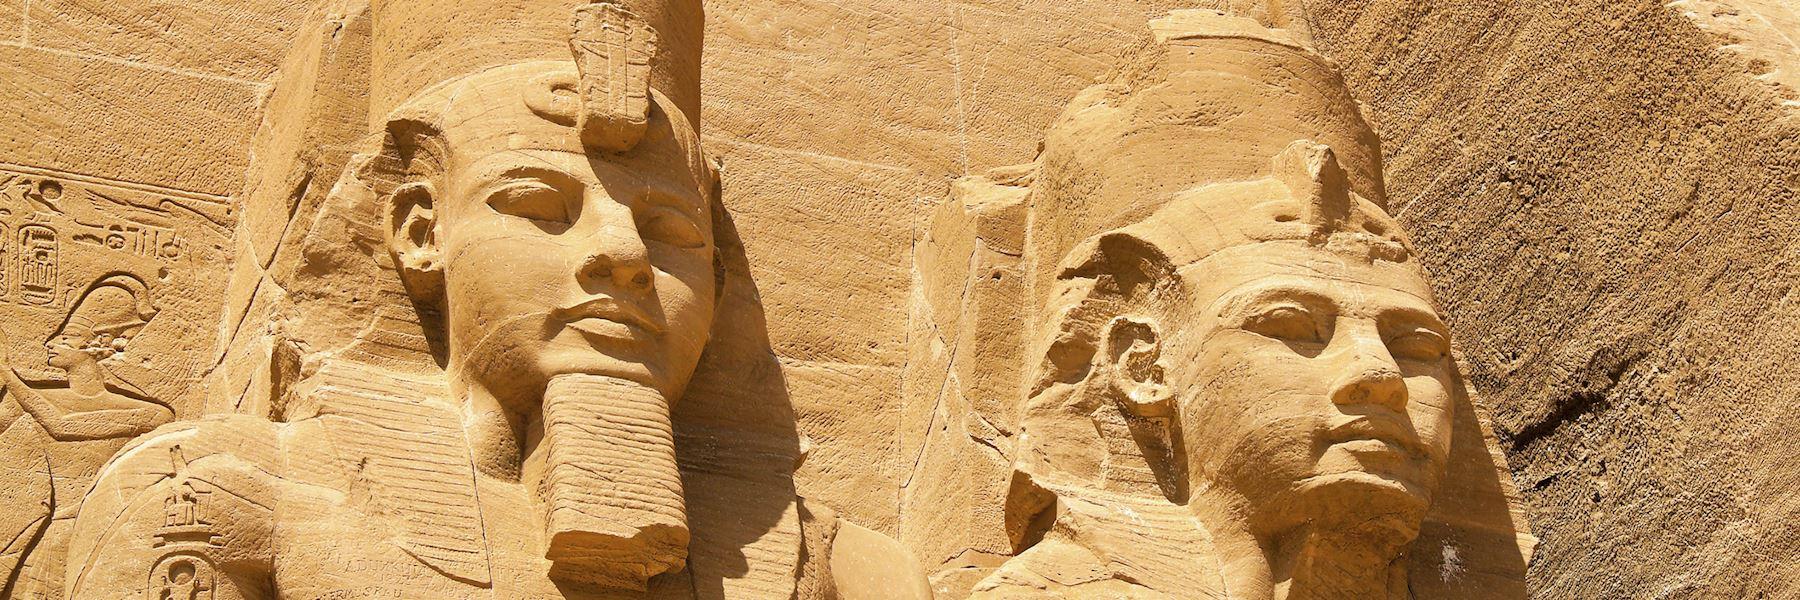 Visit Abu Simbel, Egypt